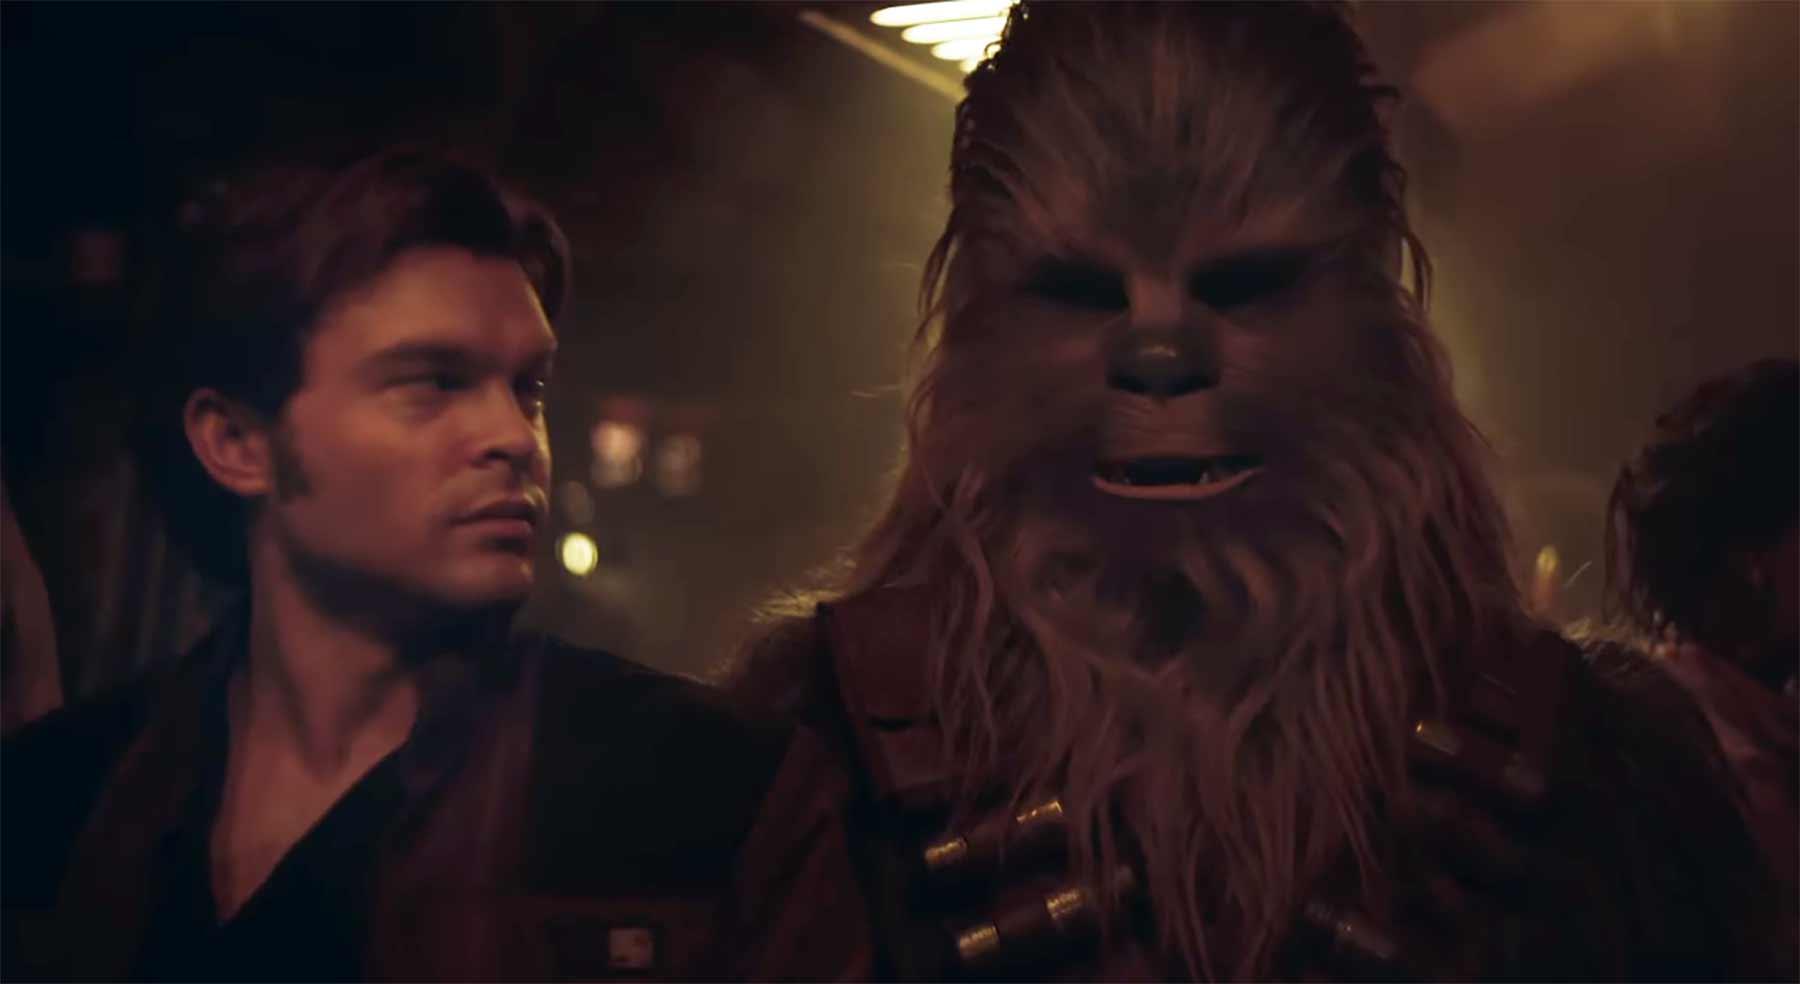 Neuer Trailer zum Han Solo-Film solo-a-star-wars-story-trailer